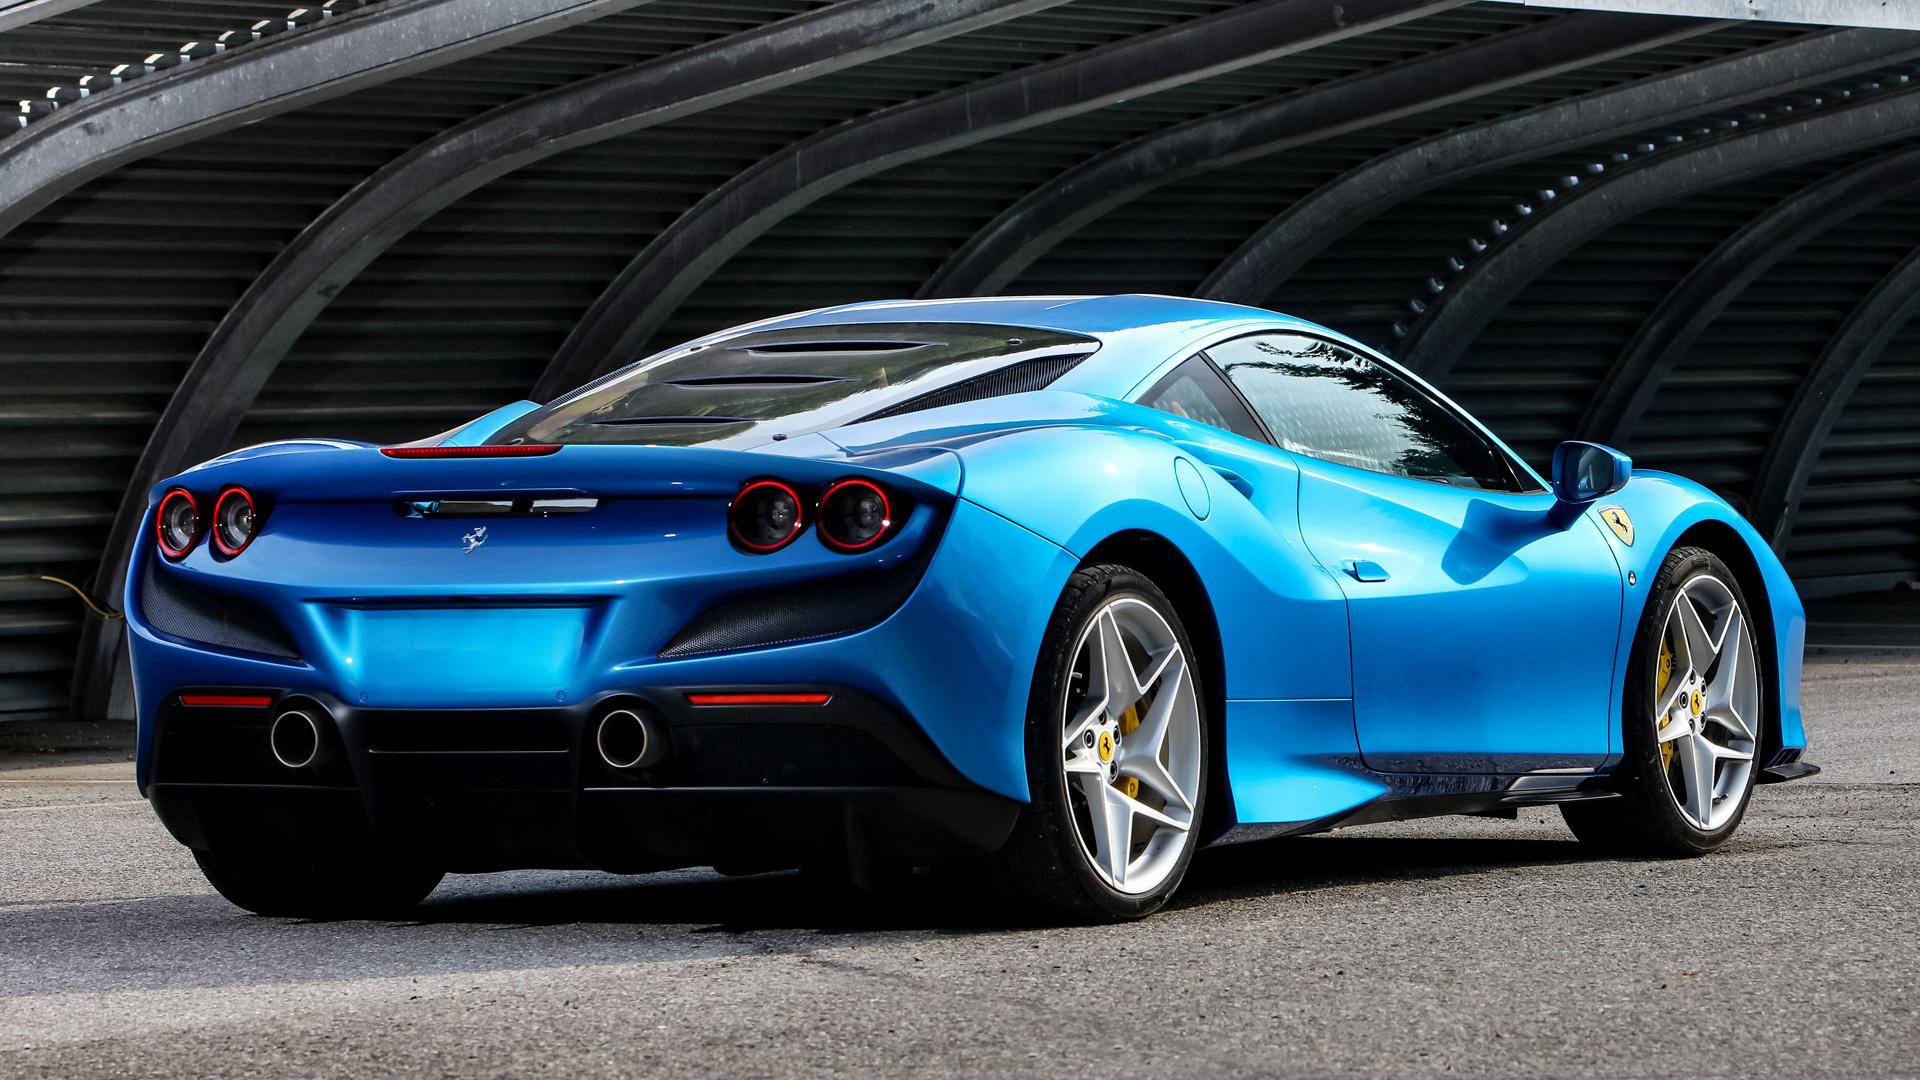 2020 Ferrari F8 Tributo Wallpapers And Hd Images Car Pixel